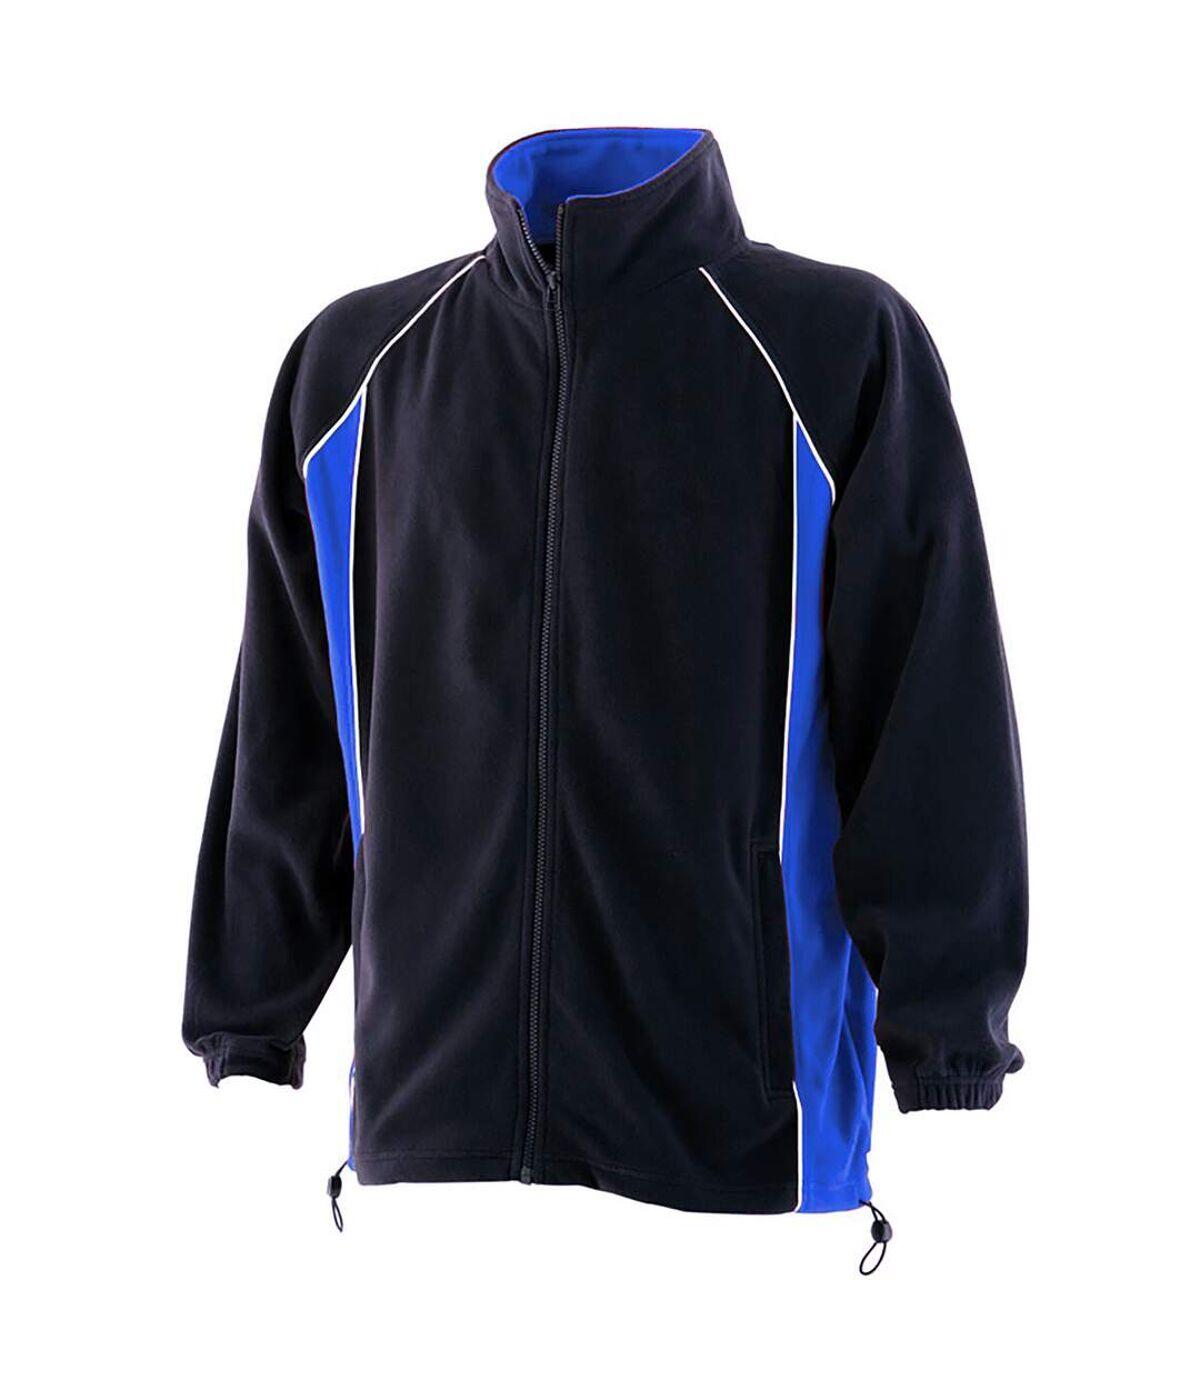 Finden & Hales - Veste polaire - Homme (Bleu marine/Bleu roi/Blanc) - UTRW434